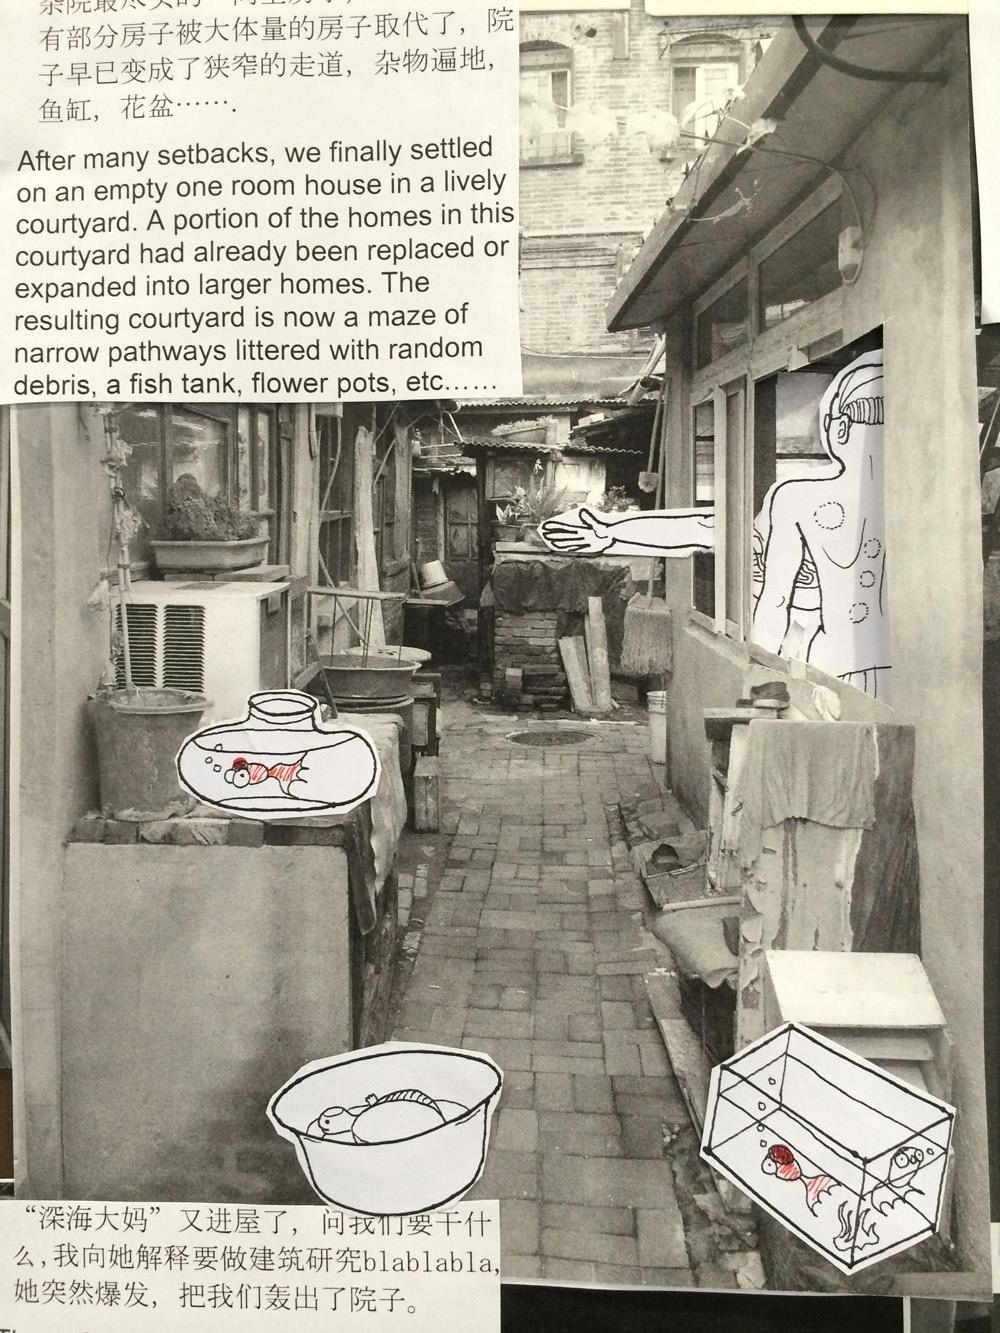 Caopu-humble-hostel-story-hisheji (4)